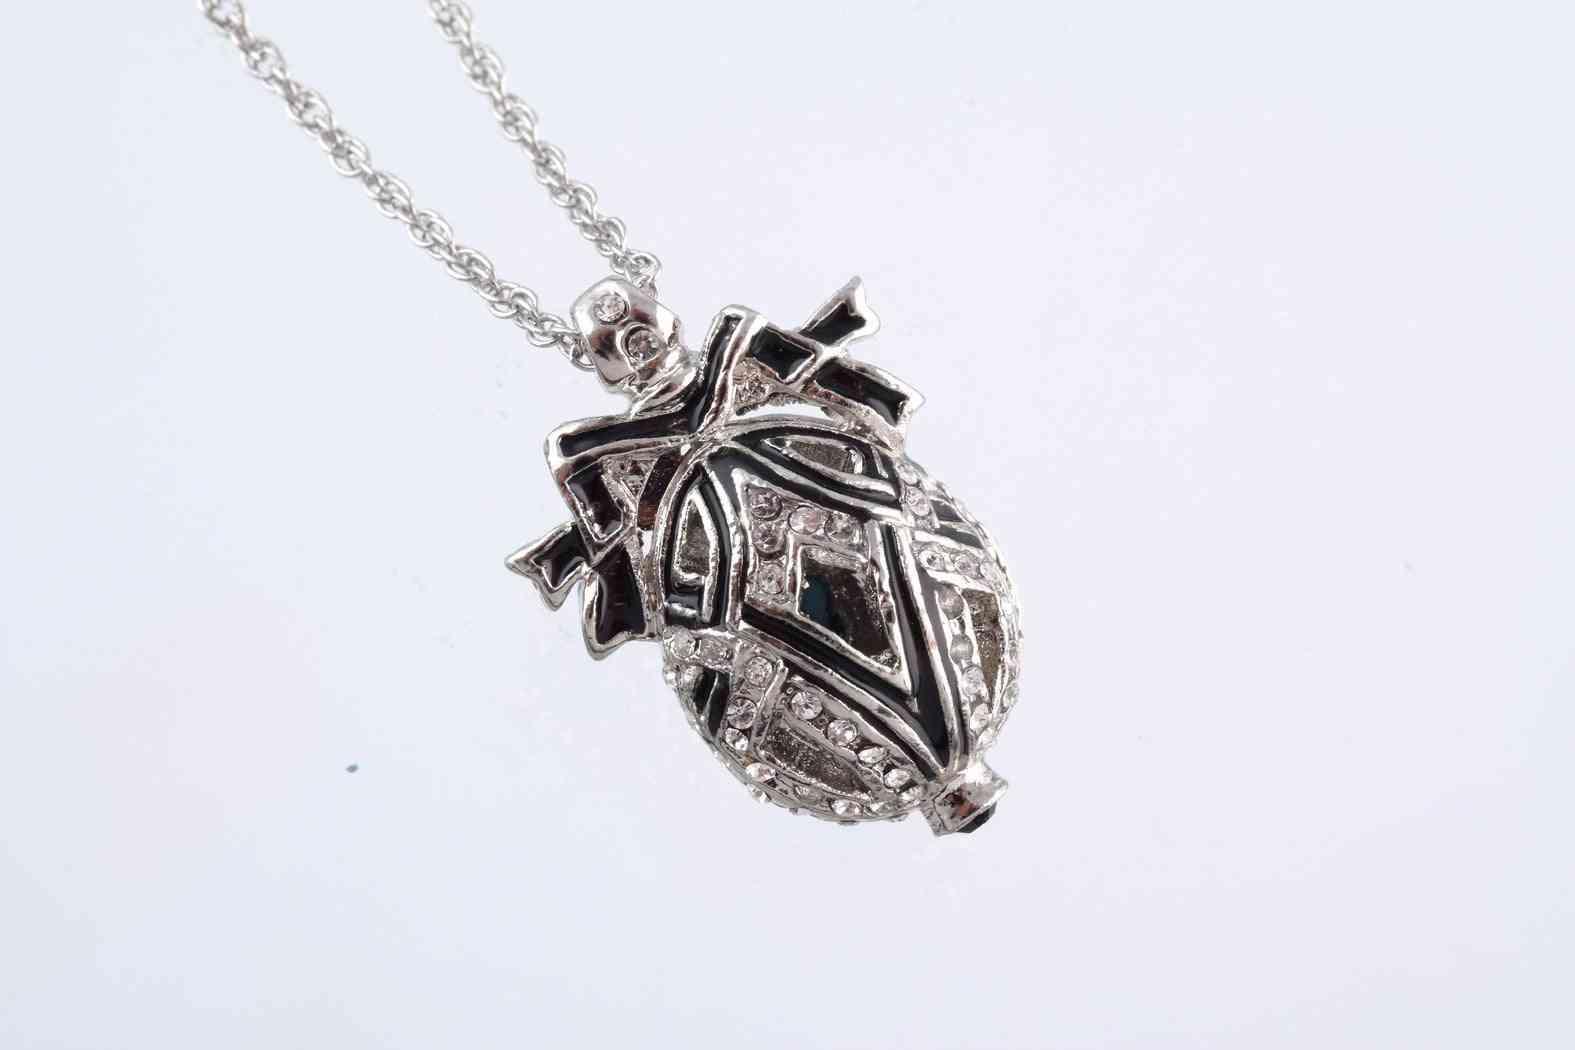 Silver & Black Egg Pendant - Necklace